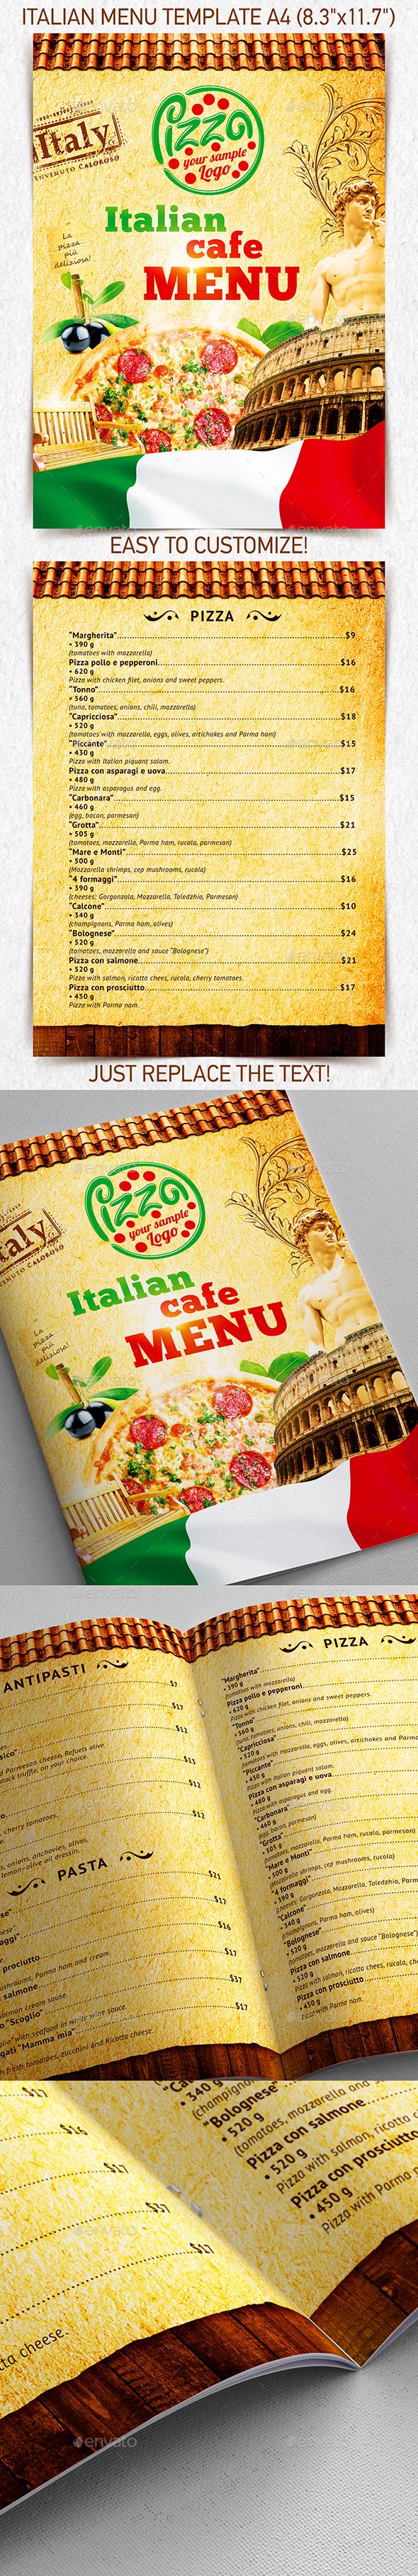 Italian Menu Template vol.2 - Food Menus Print Templates